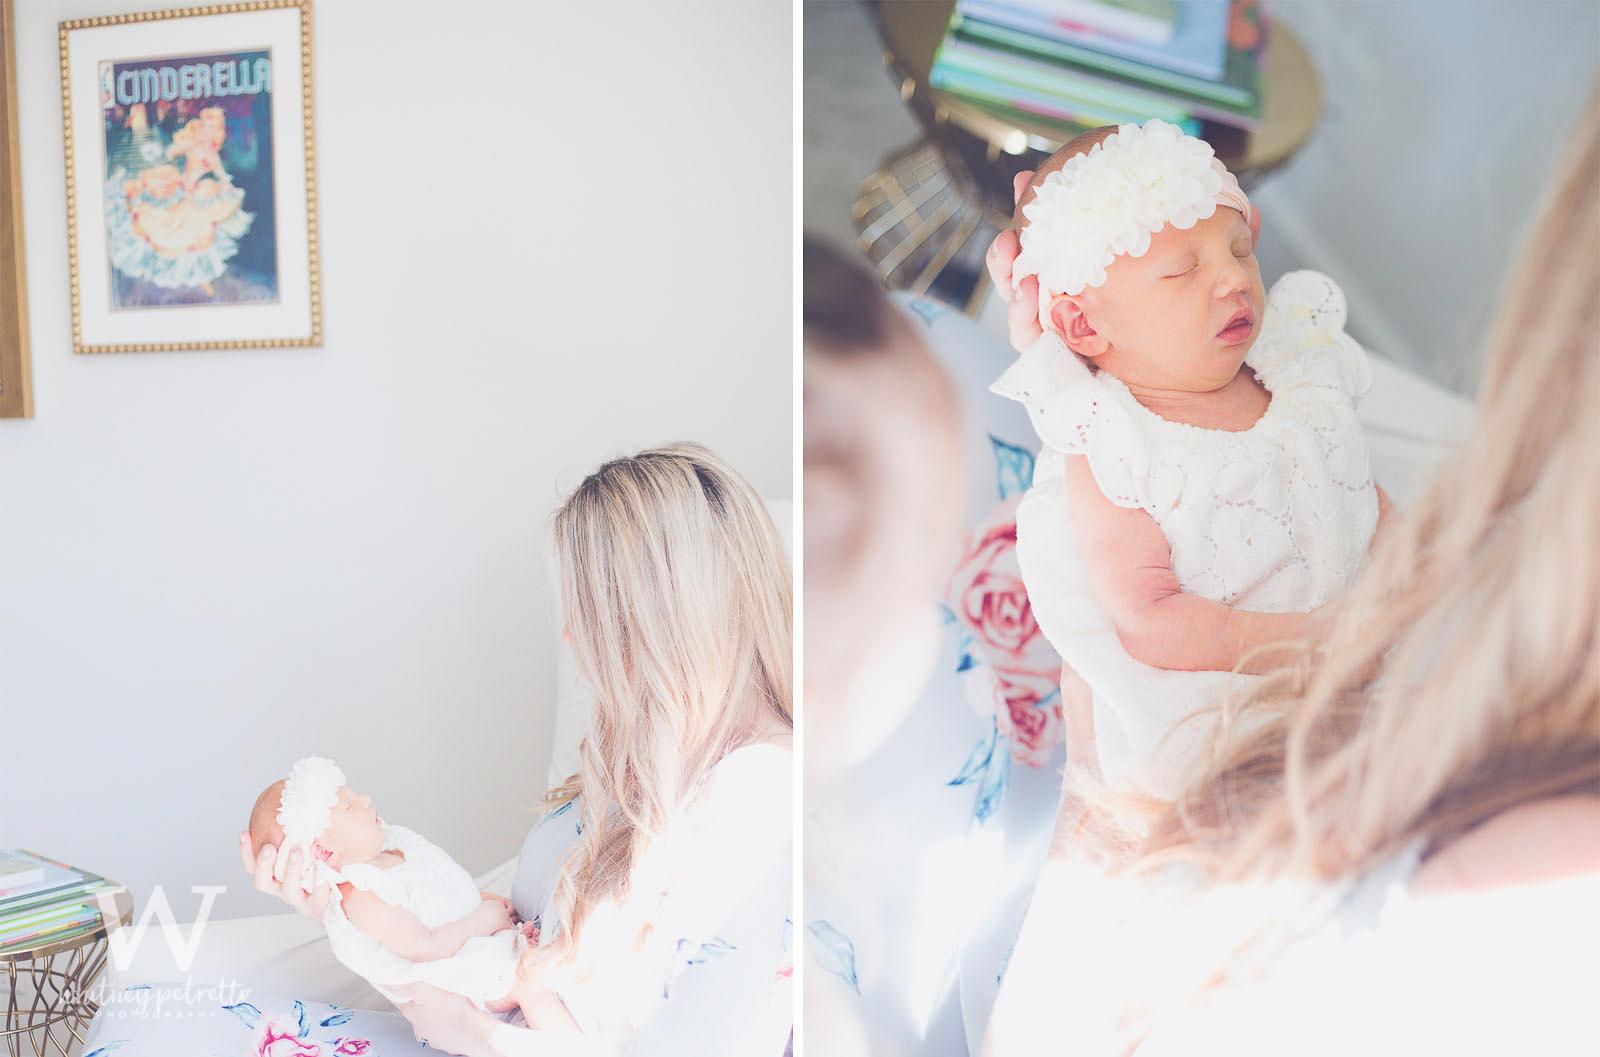 Makinson Family | Newborn Photographer | Family Photographer | Portland, OR | Whitney Petretto Photography